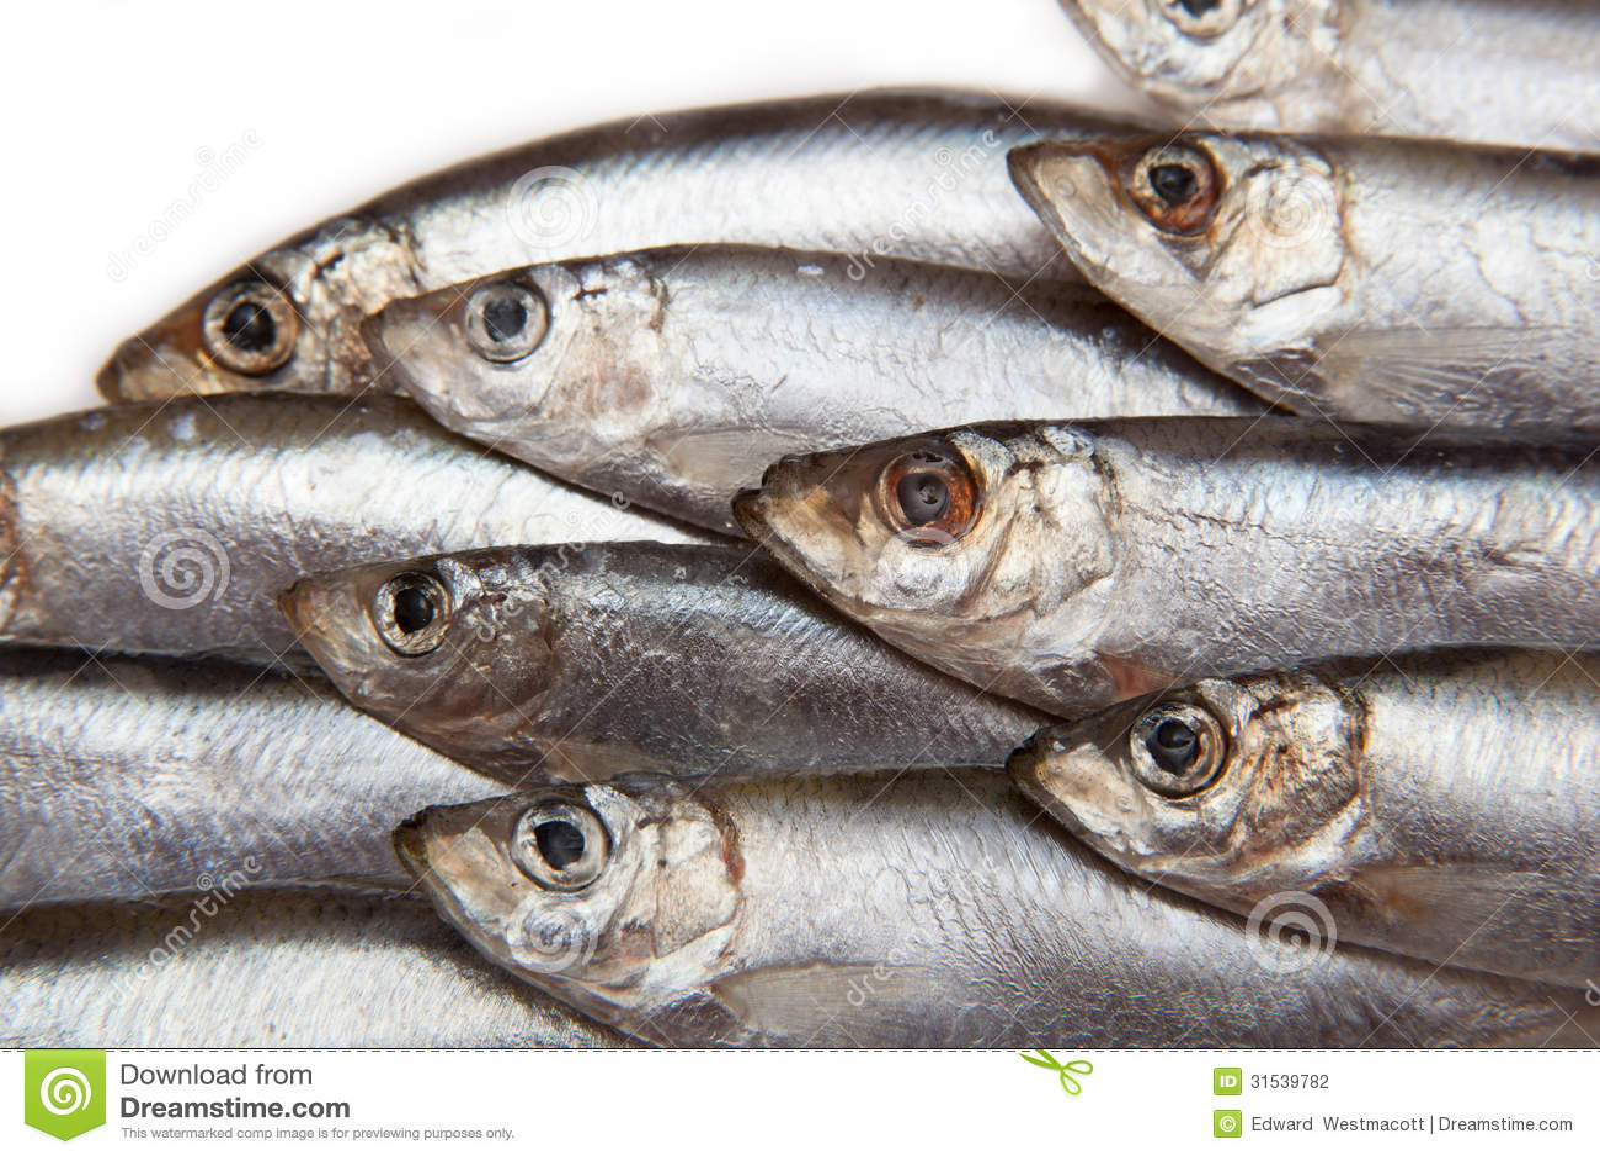 Closeup of Sprat fish stock photo. Image of aquatic. detail - 31539782